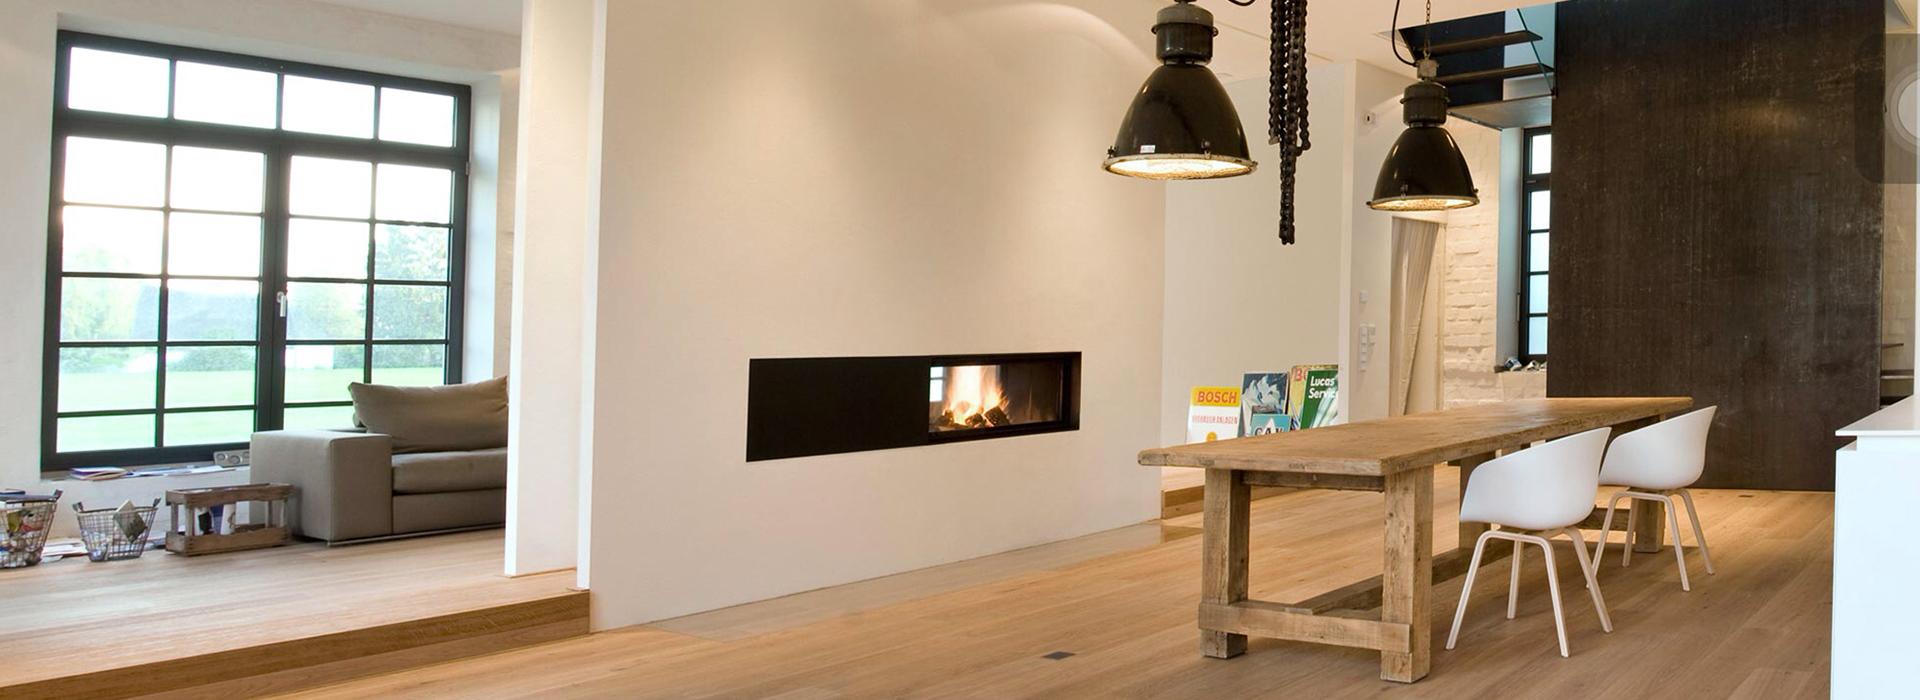 flame-design-4